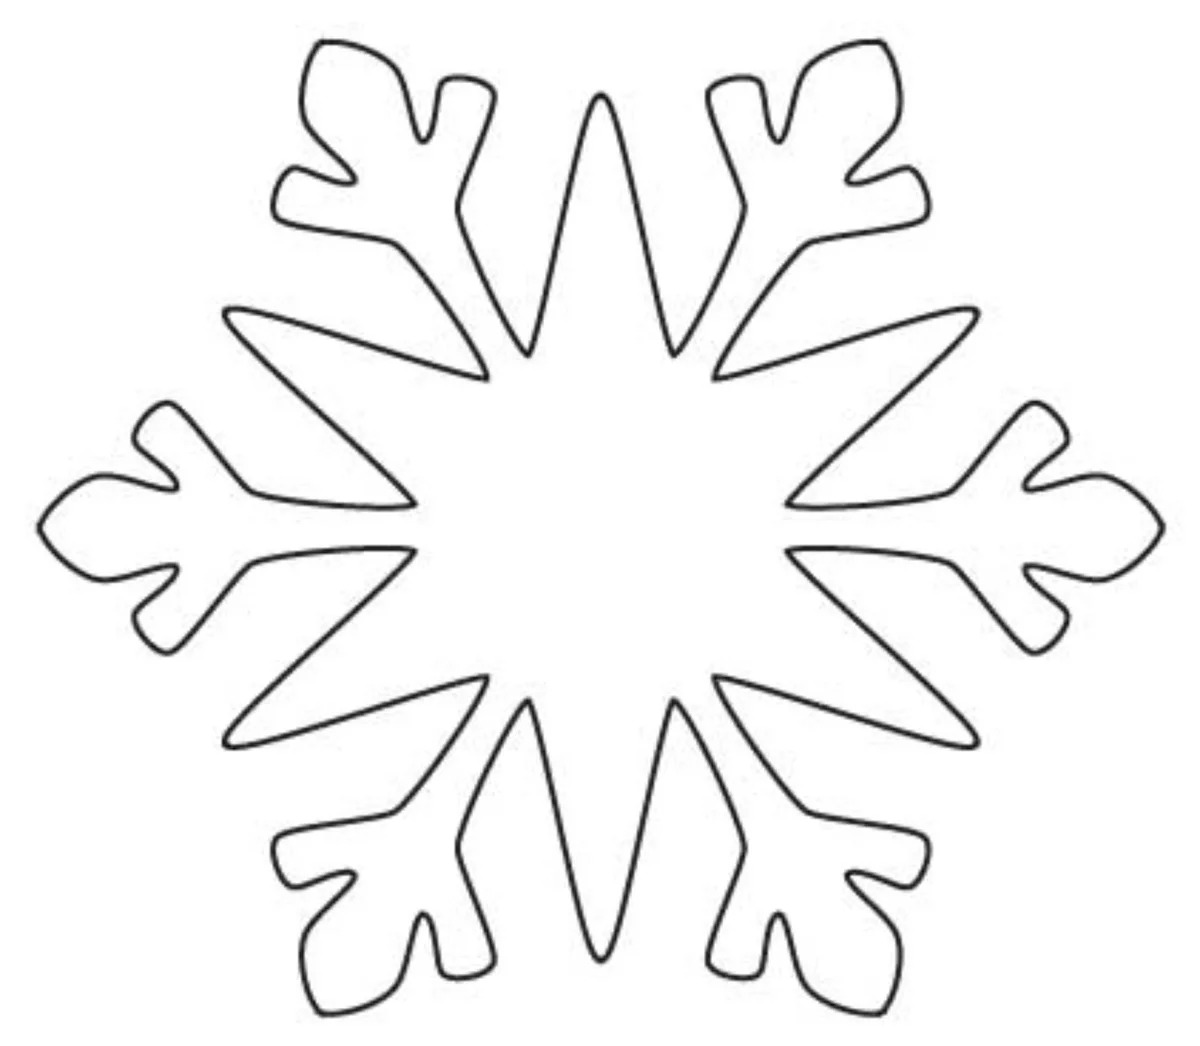 Картинки снежинки шаблон